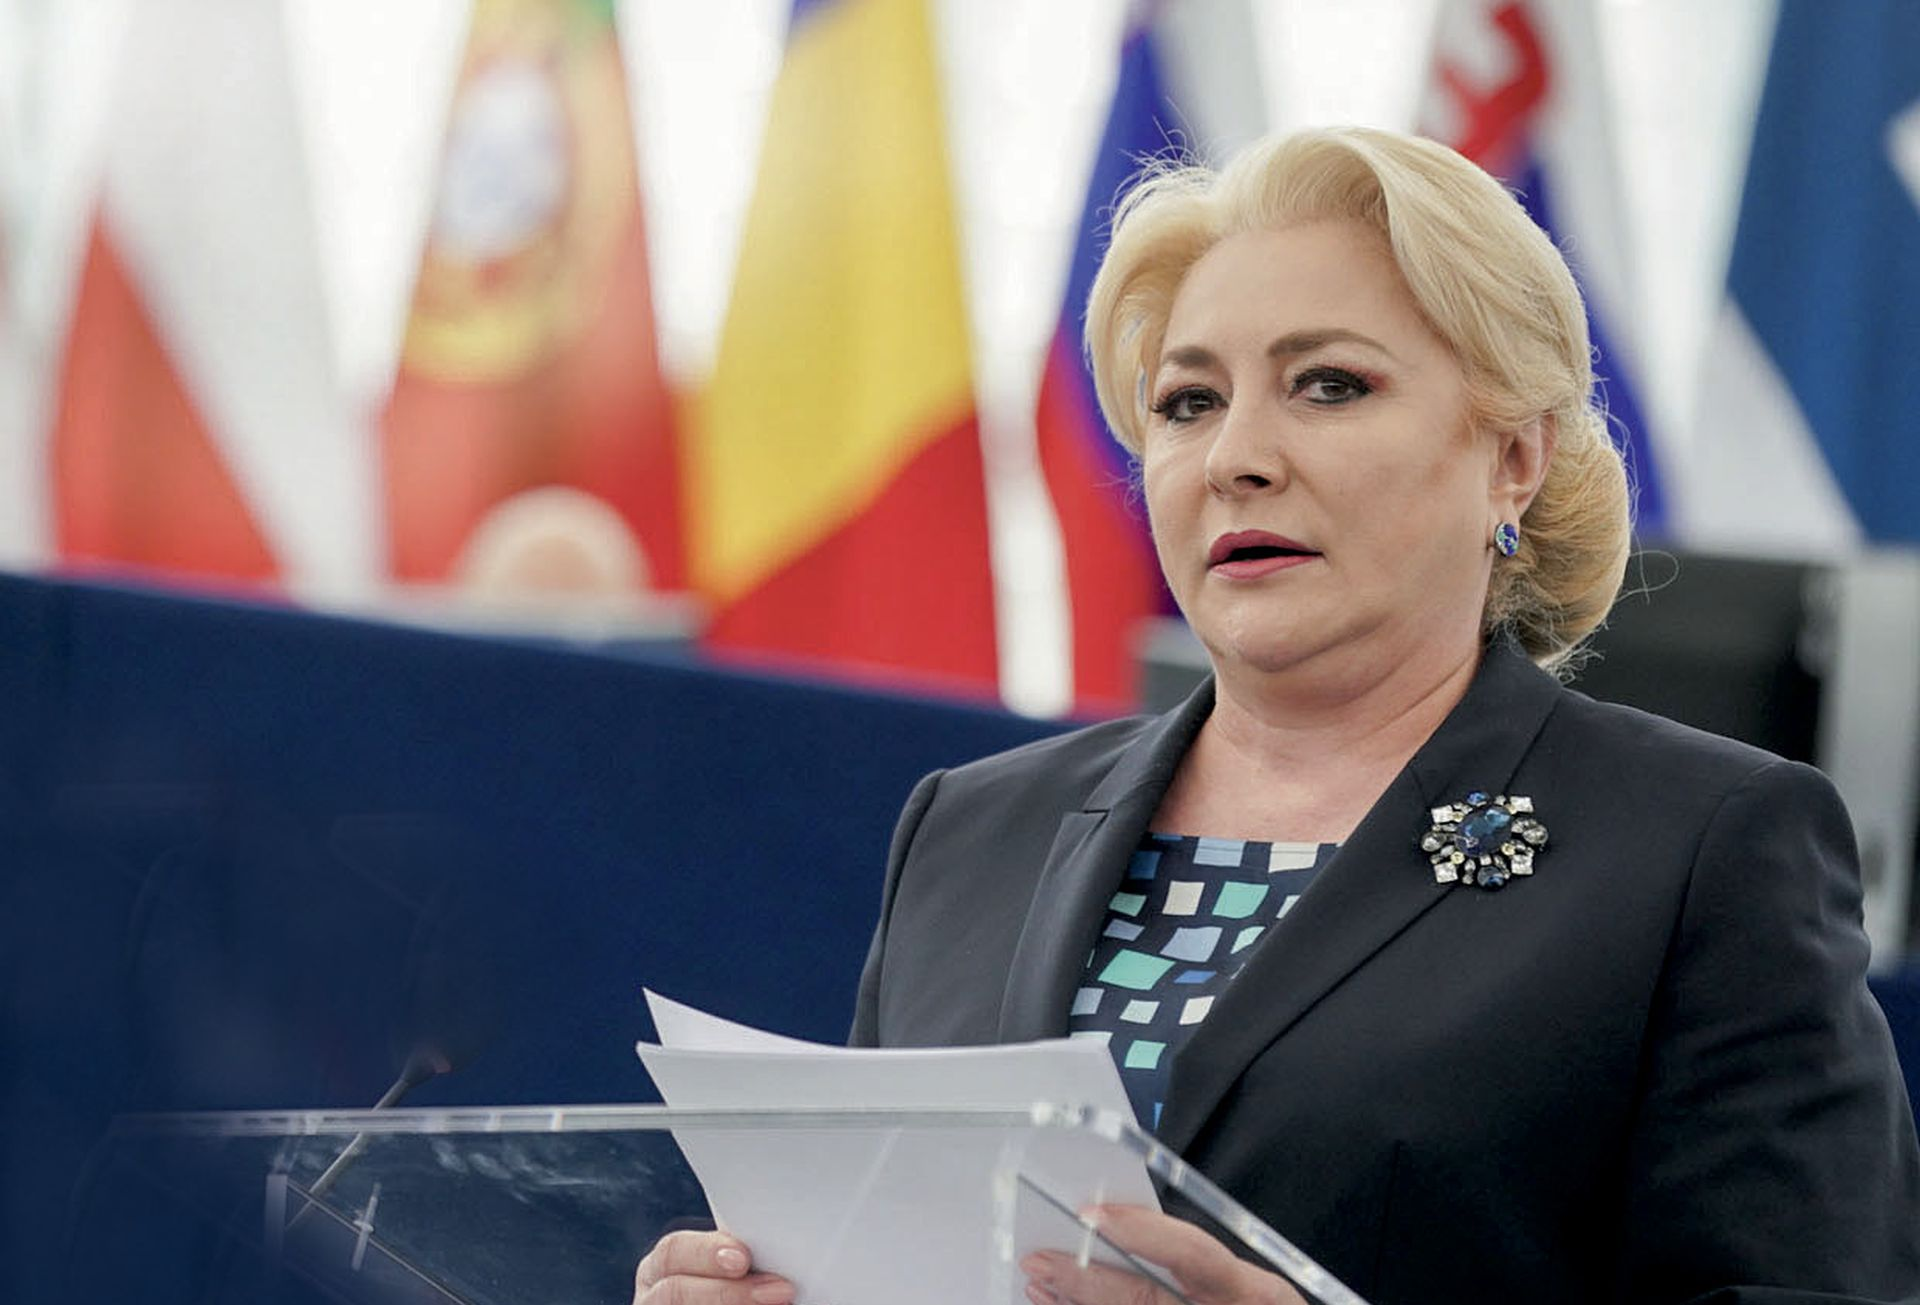 DĂNCILĂ 'Ne želim da se Rumunjsku trpa u isti koš s Mađarskom'